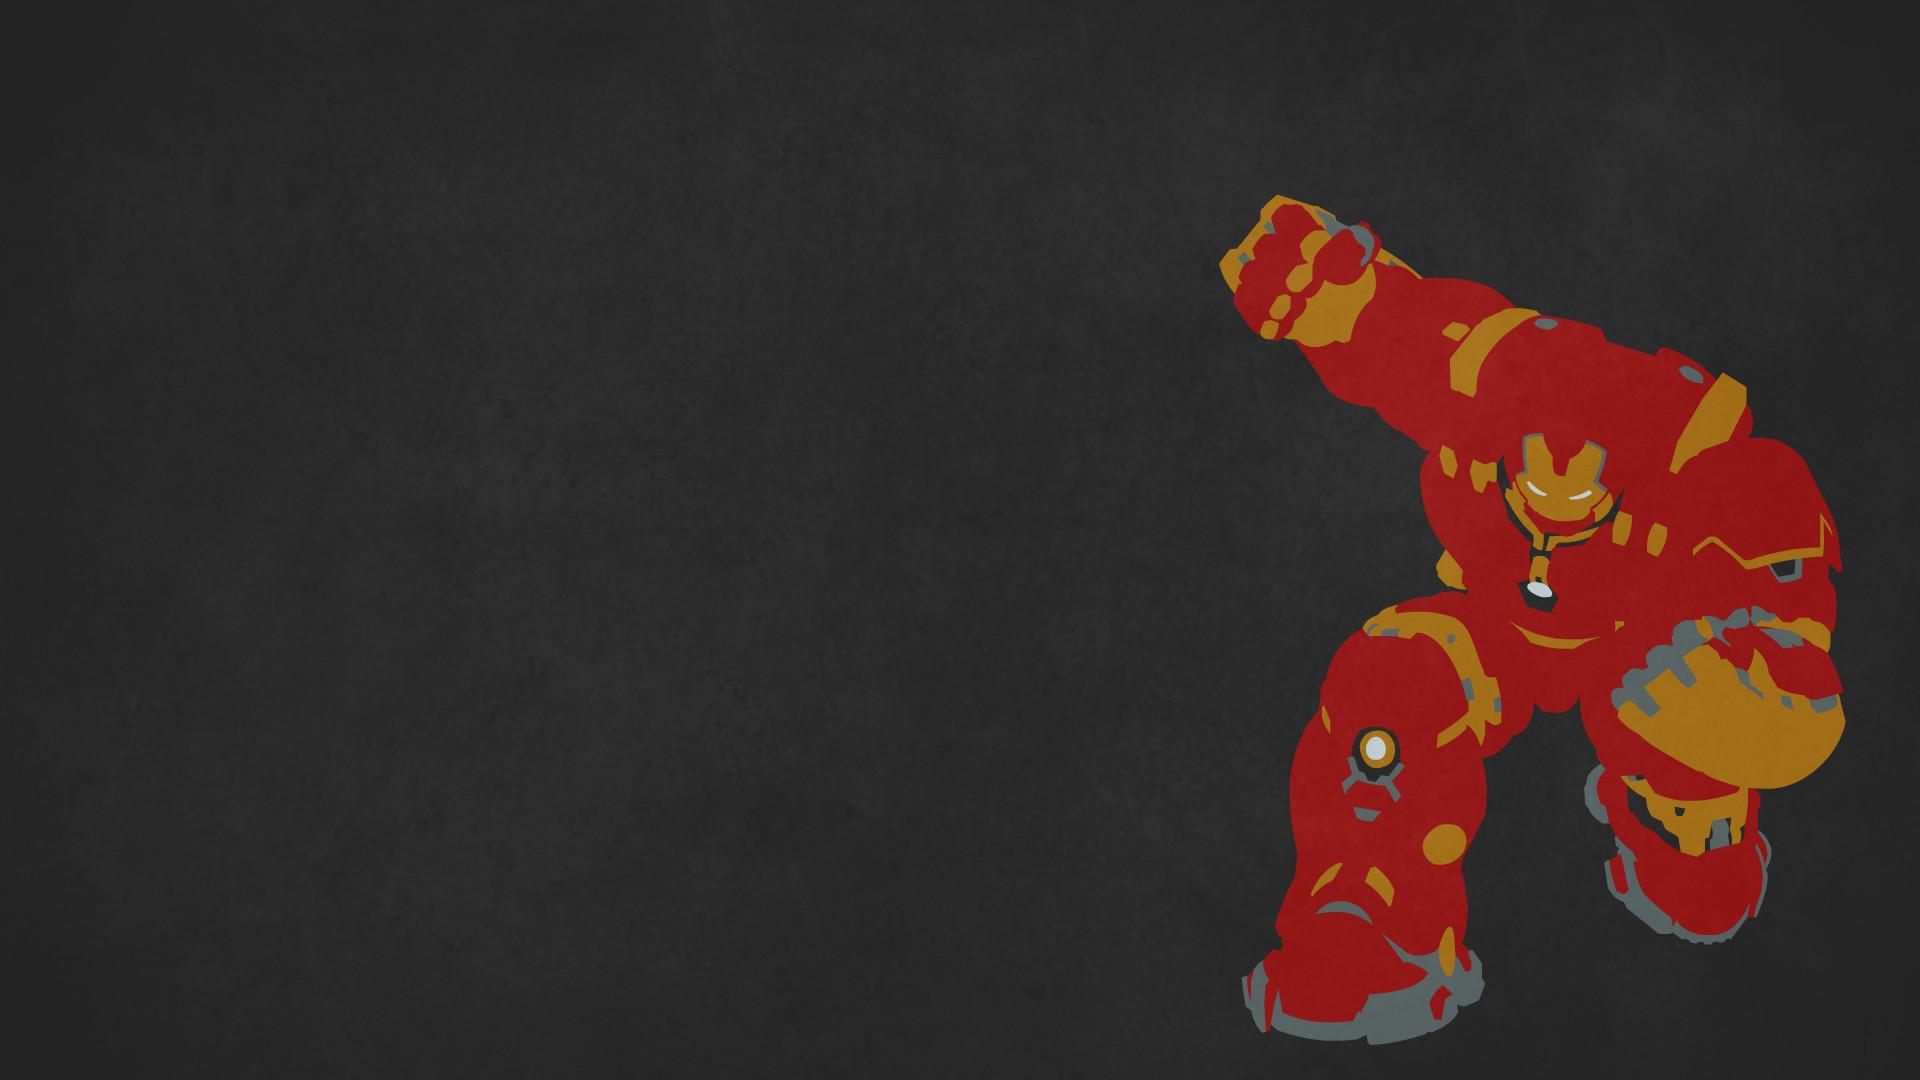 Ironman Hulkbuster 4 by dragonitearmy Ironman Hulkbuster 4 by dragonitearmy